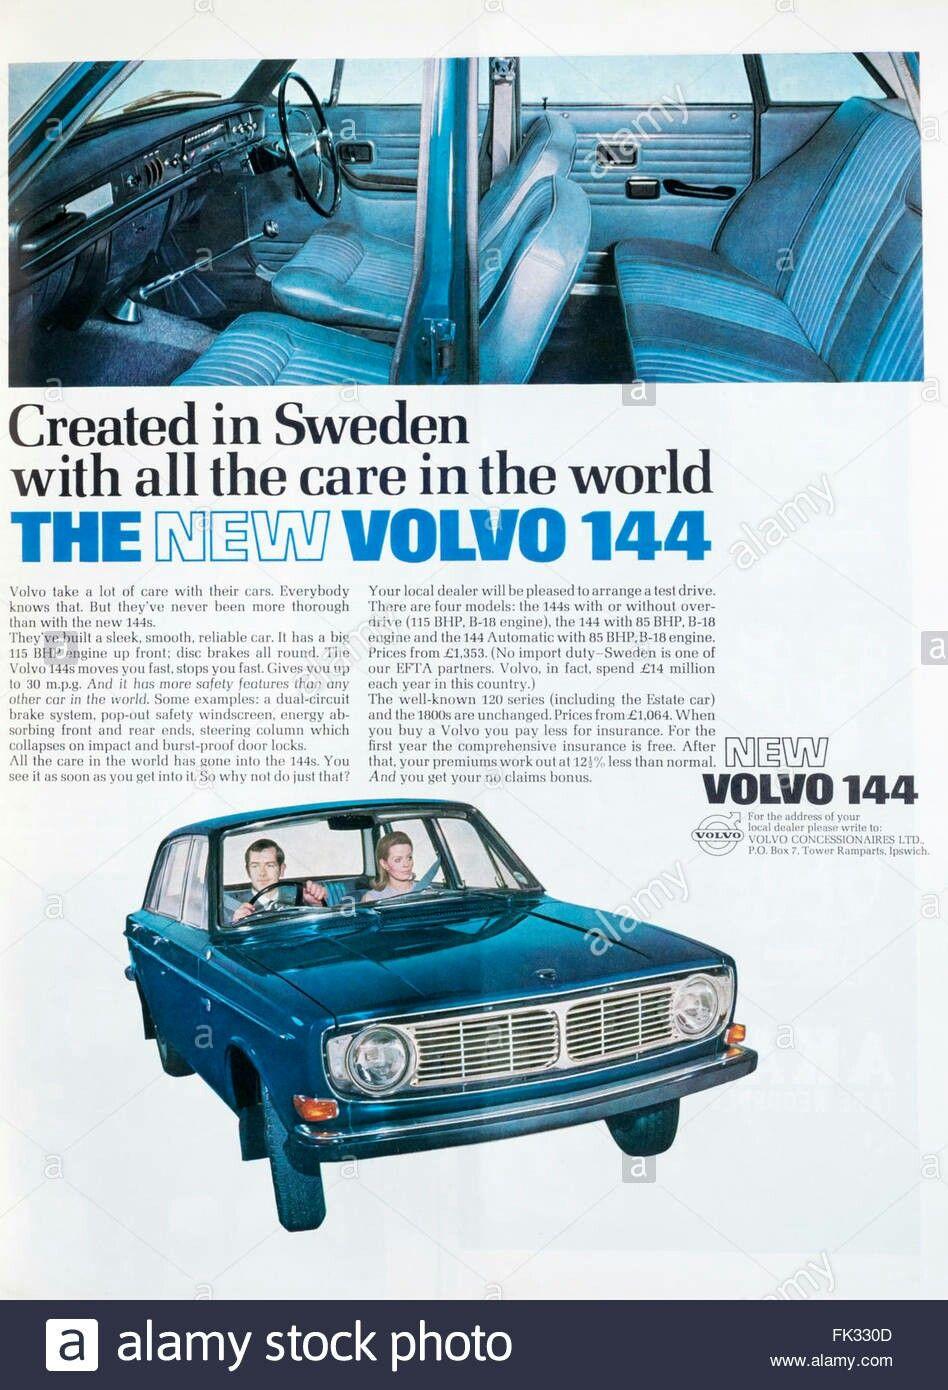 Volvo 144 Publ Volvo Volvo Cars Volvo Ad